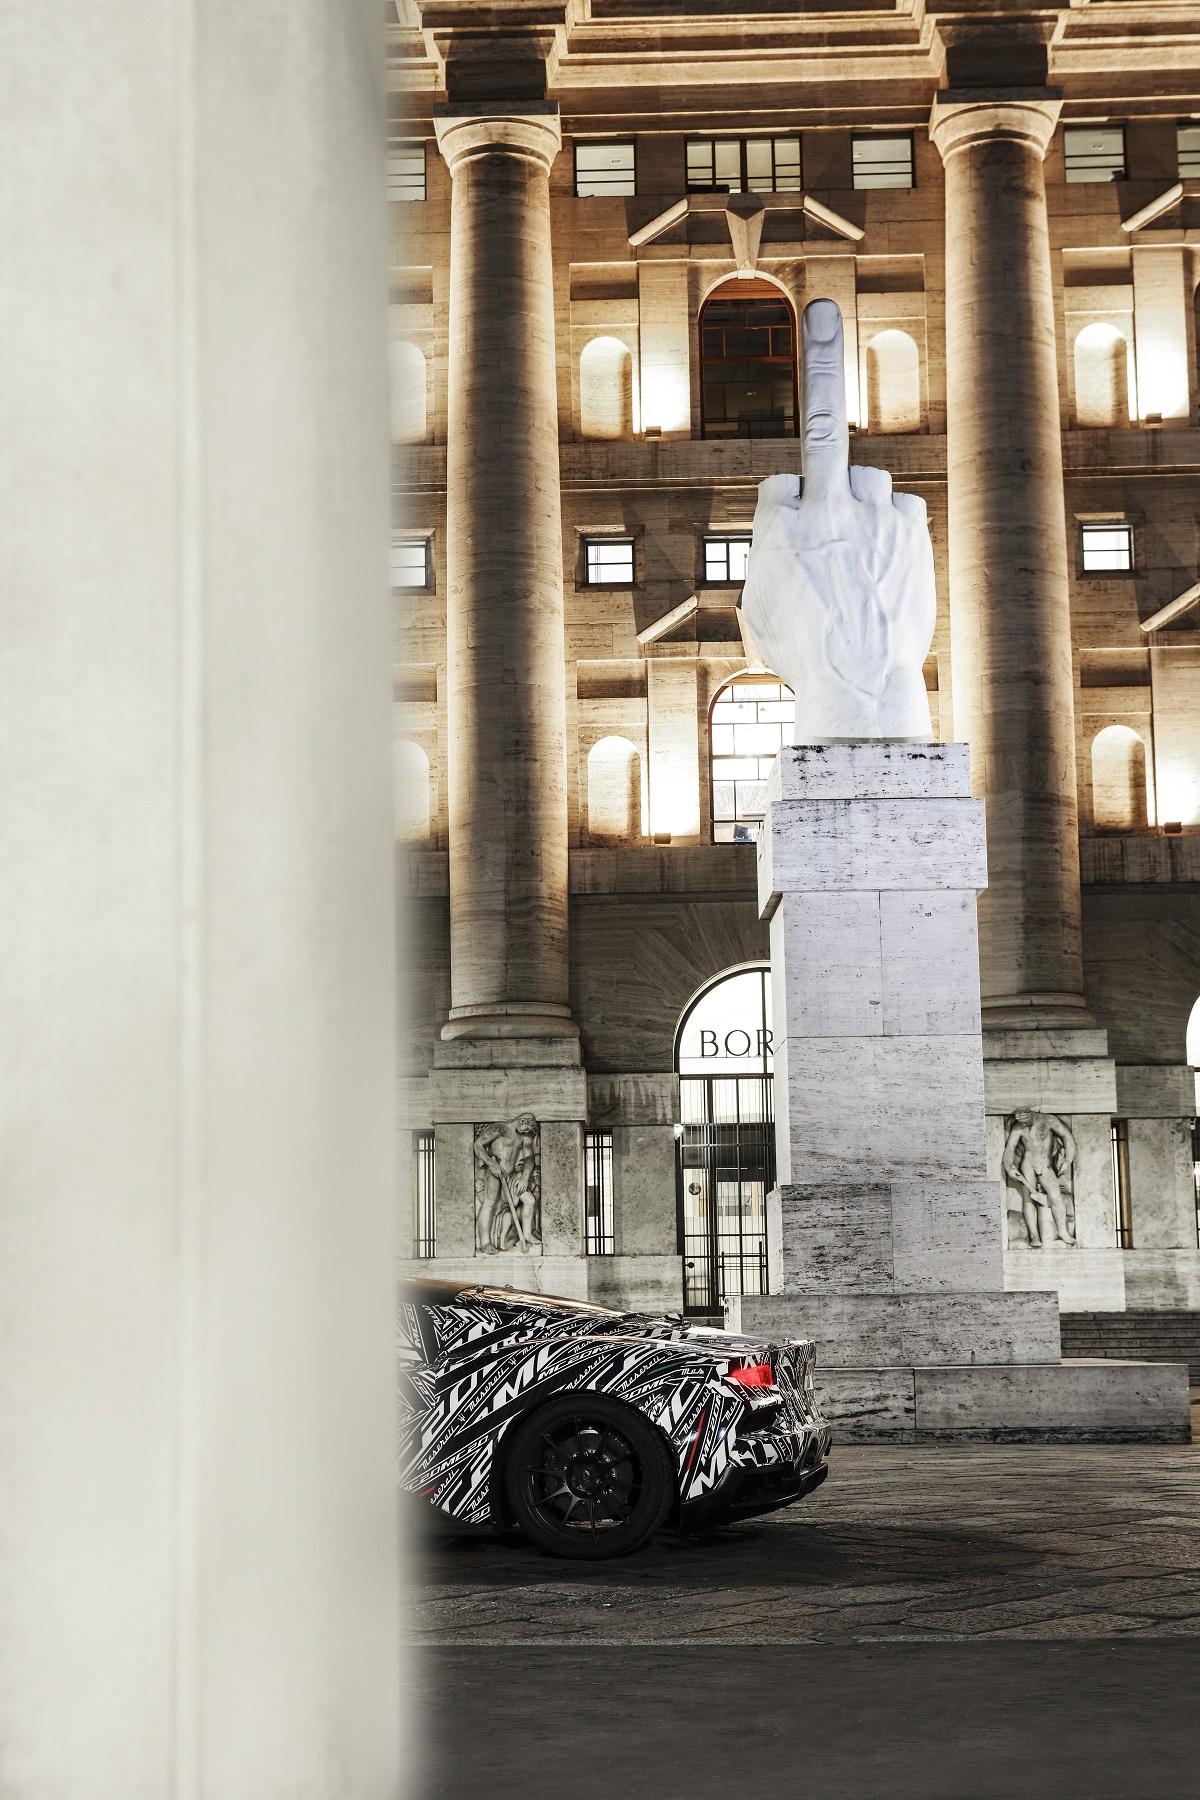 Maserati_MC20_prototype_Milano_02 - Copy.jpg